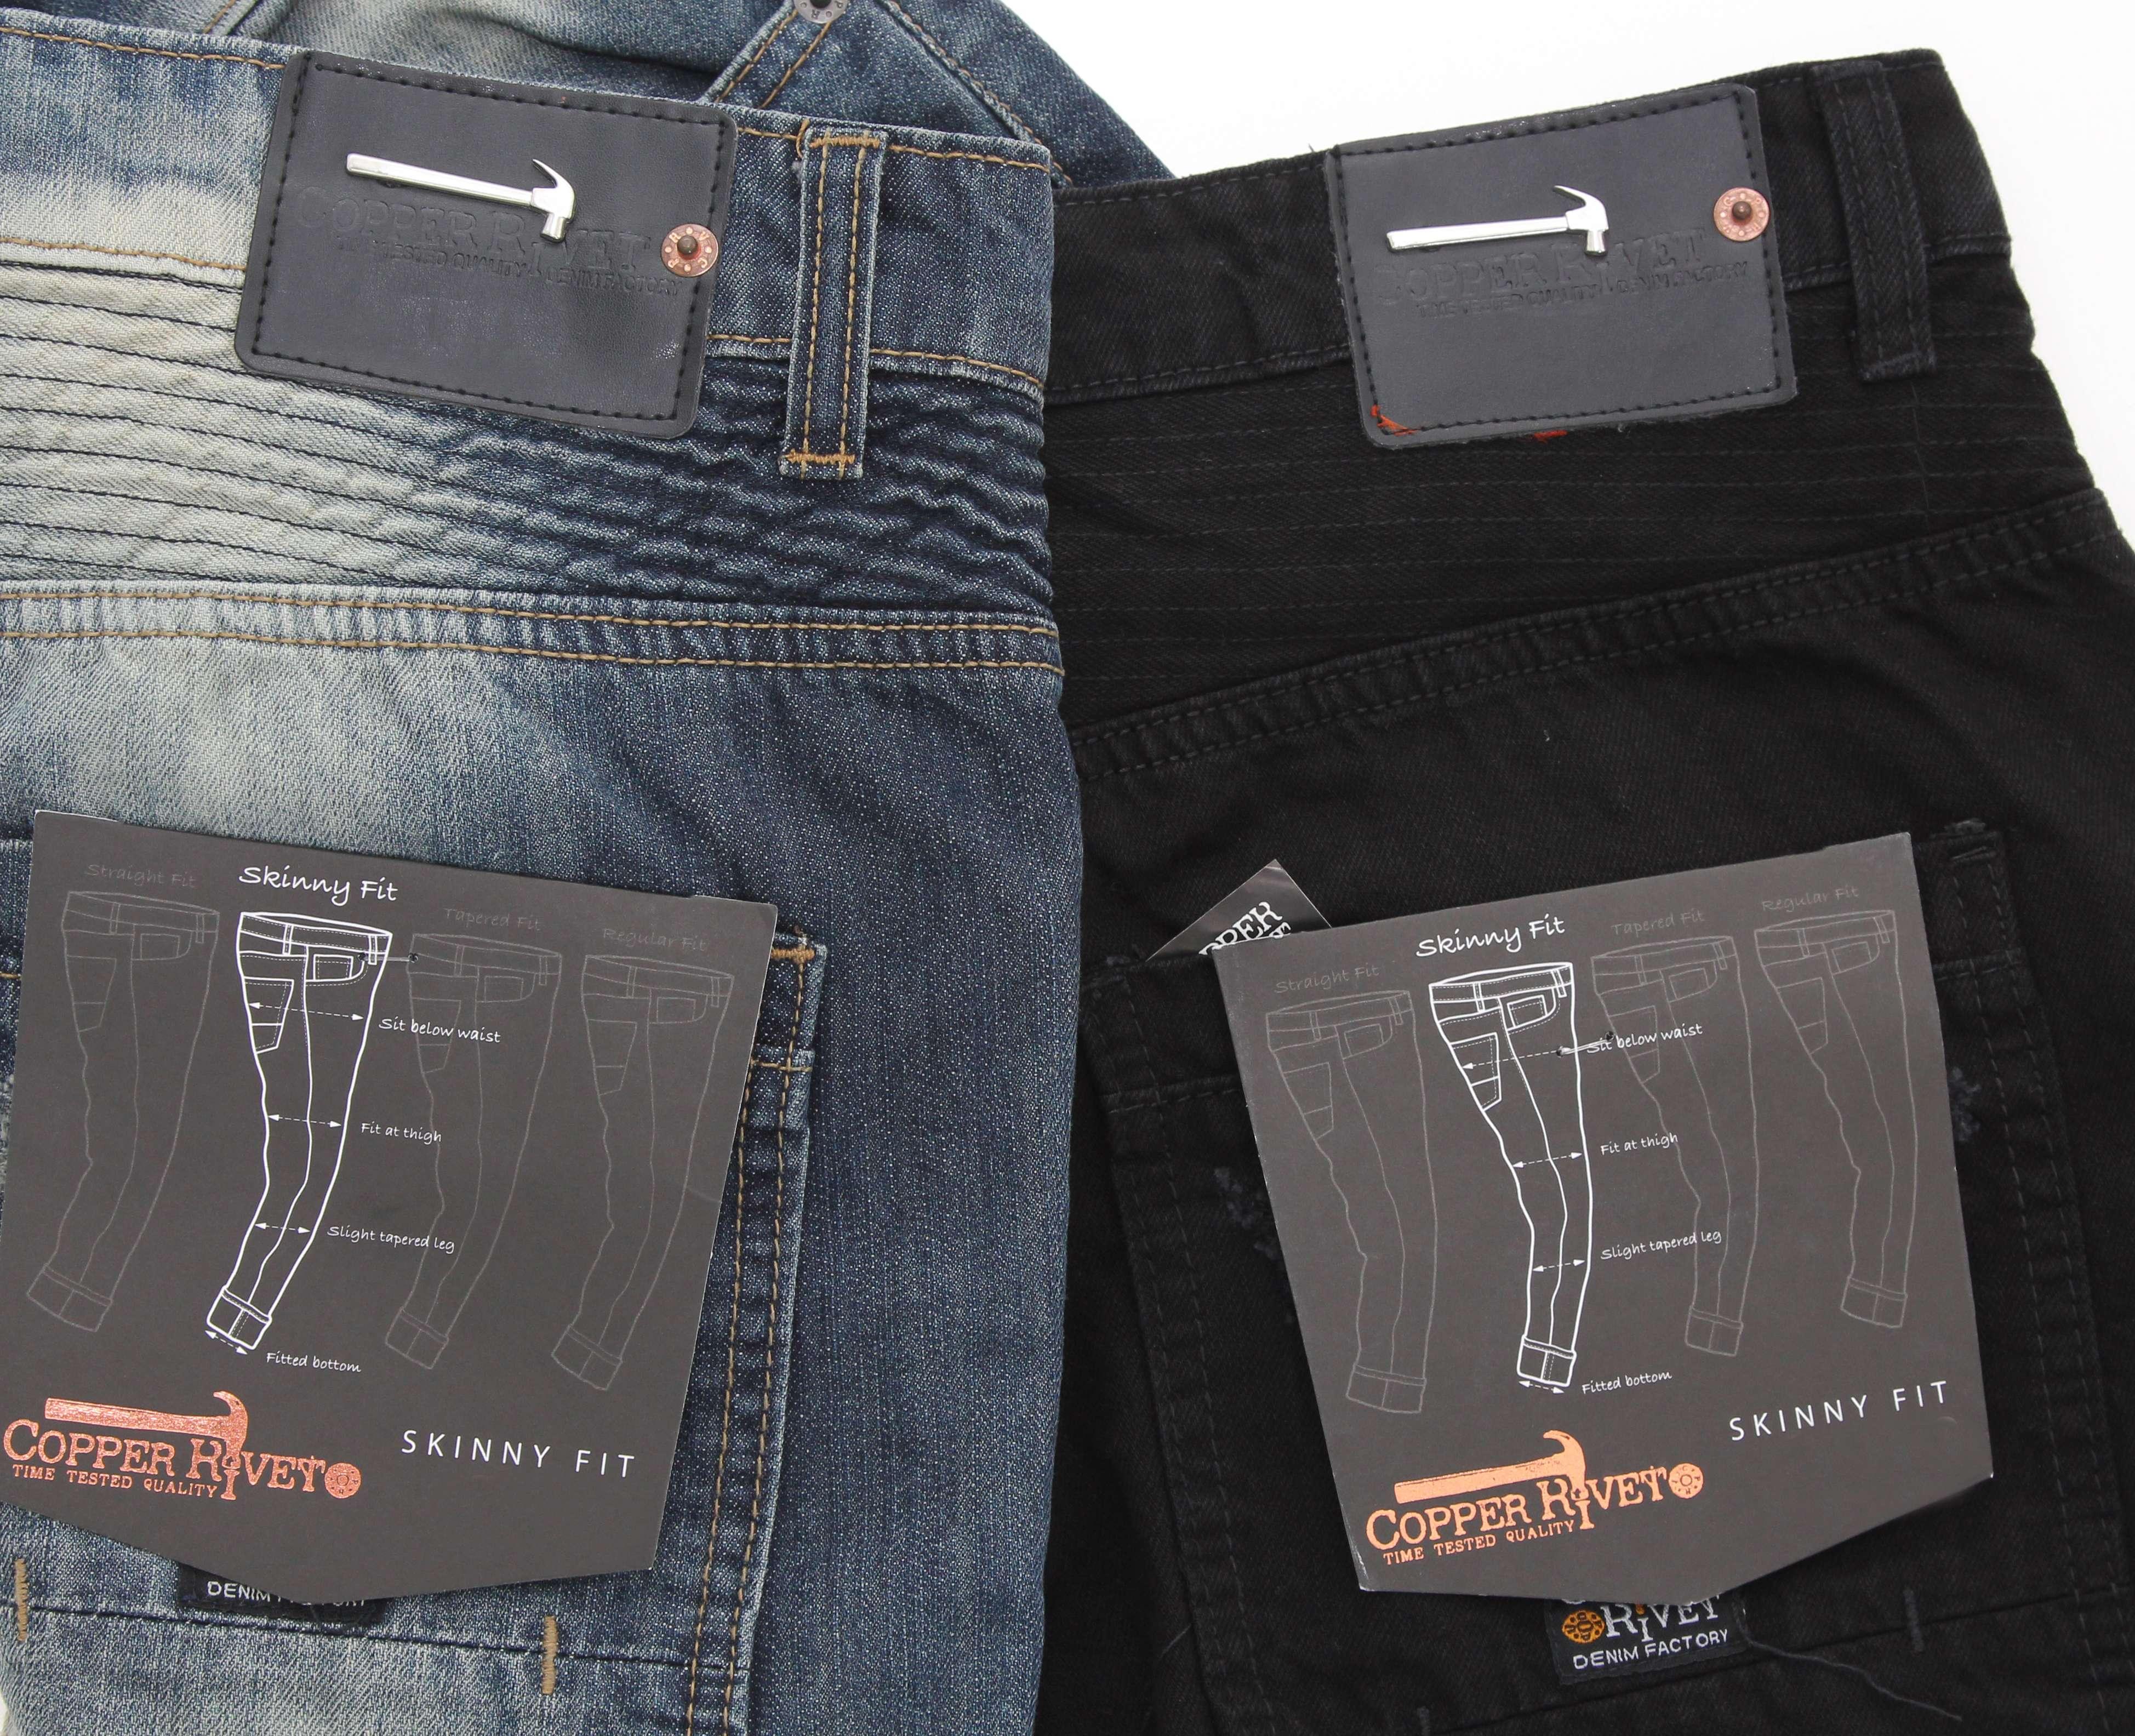 New Mens Biker Zipper Jeans By Copper Rivet Burgundy Denim Jeans